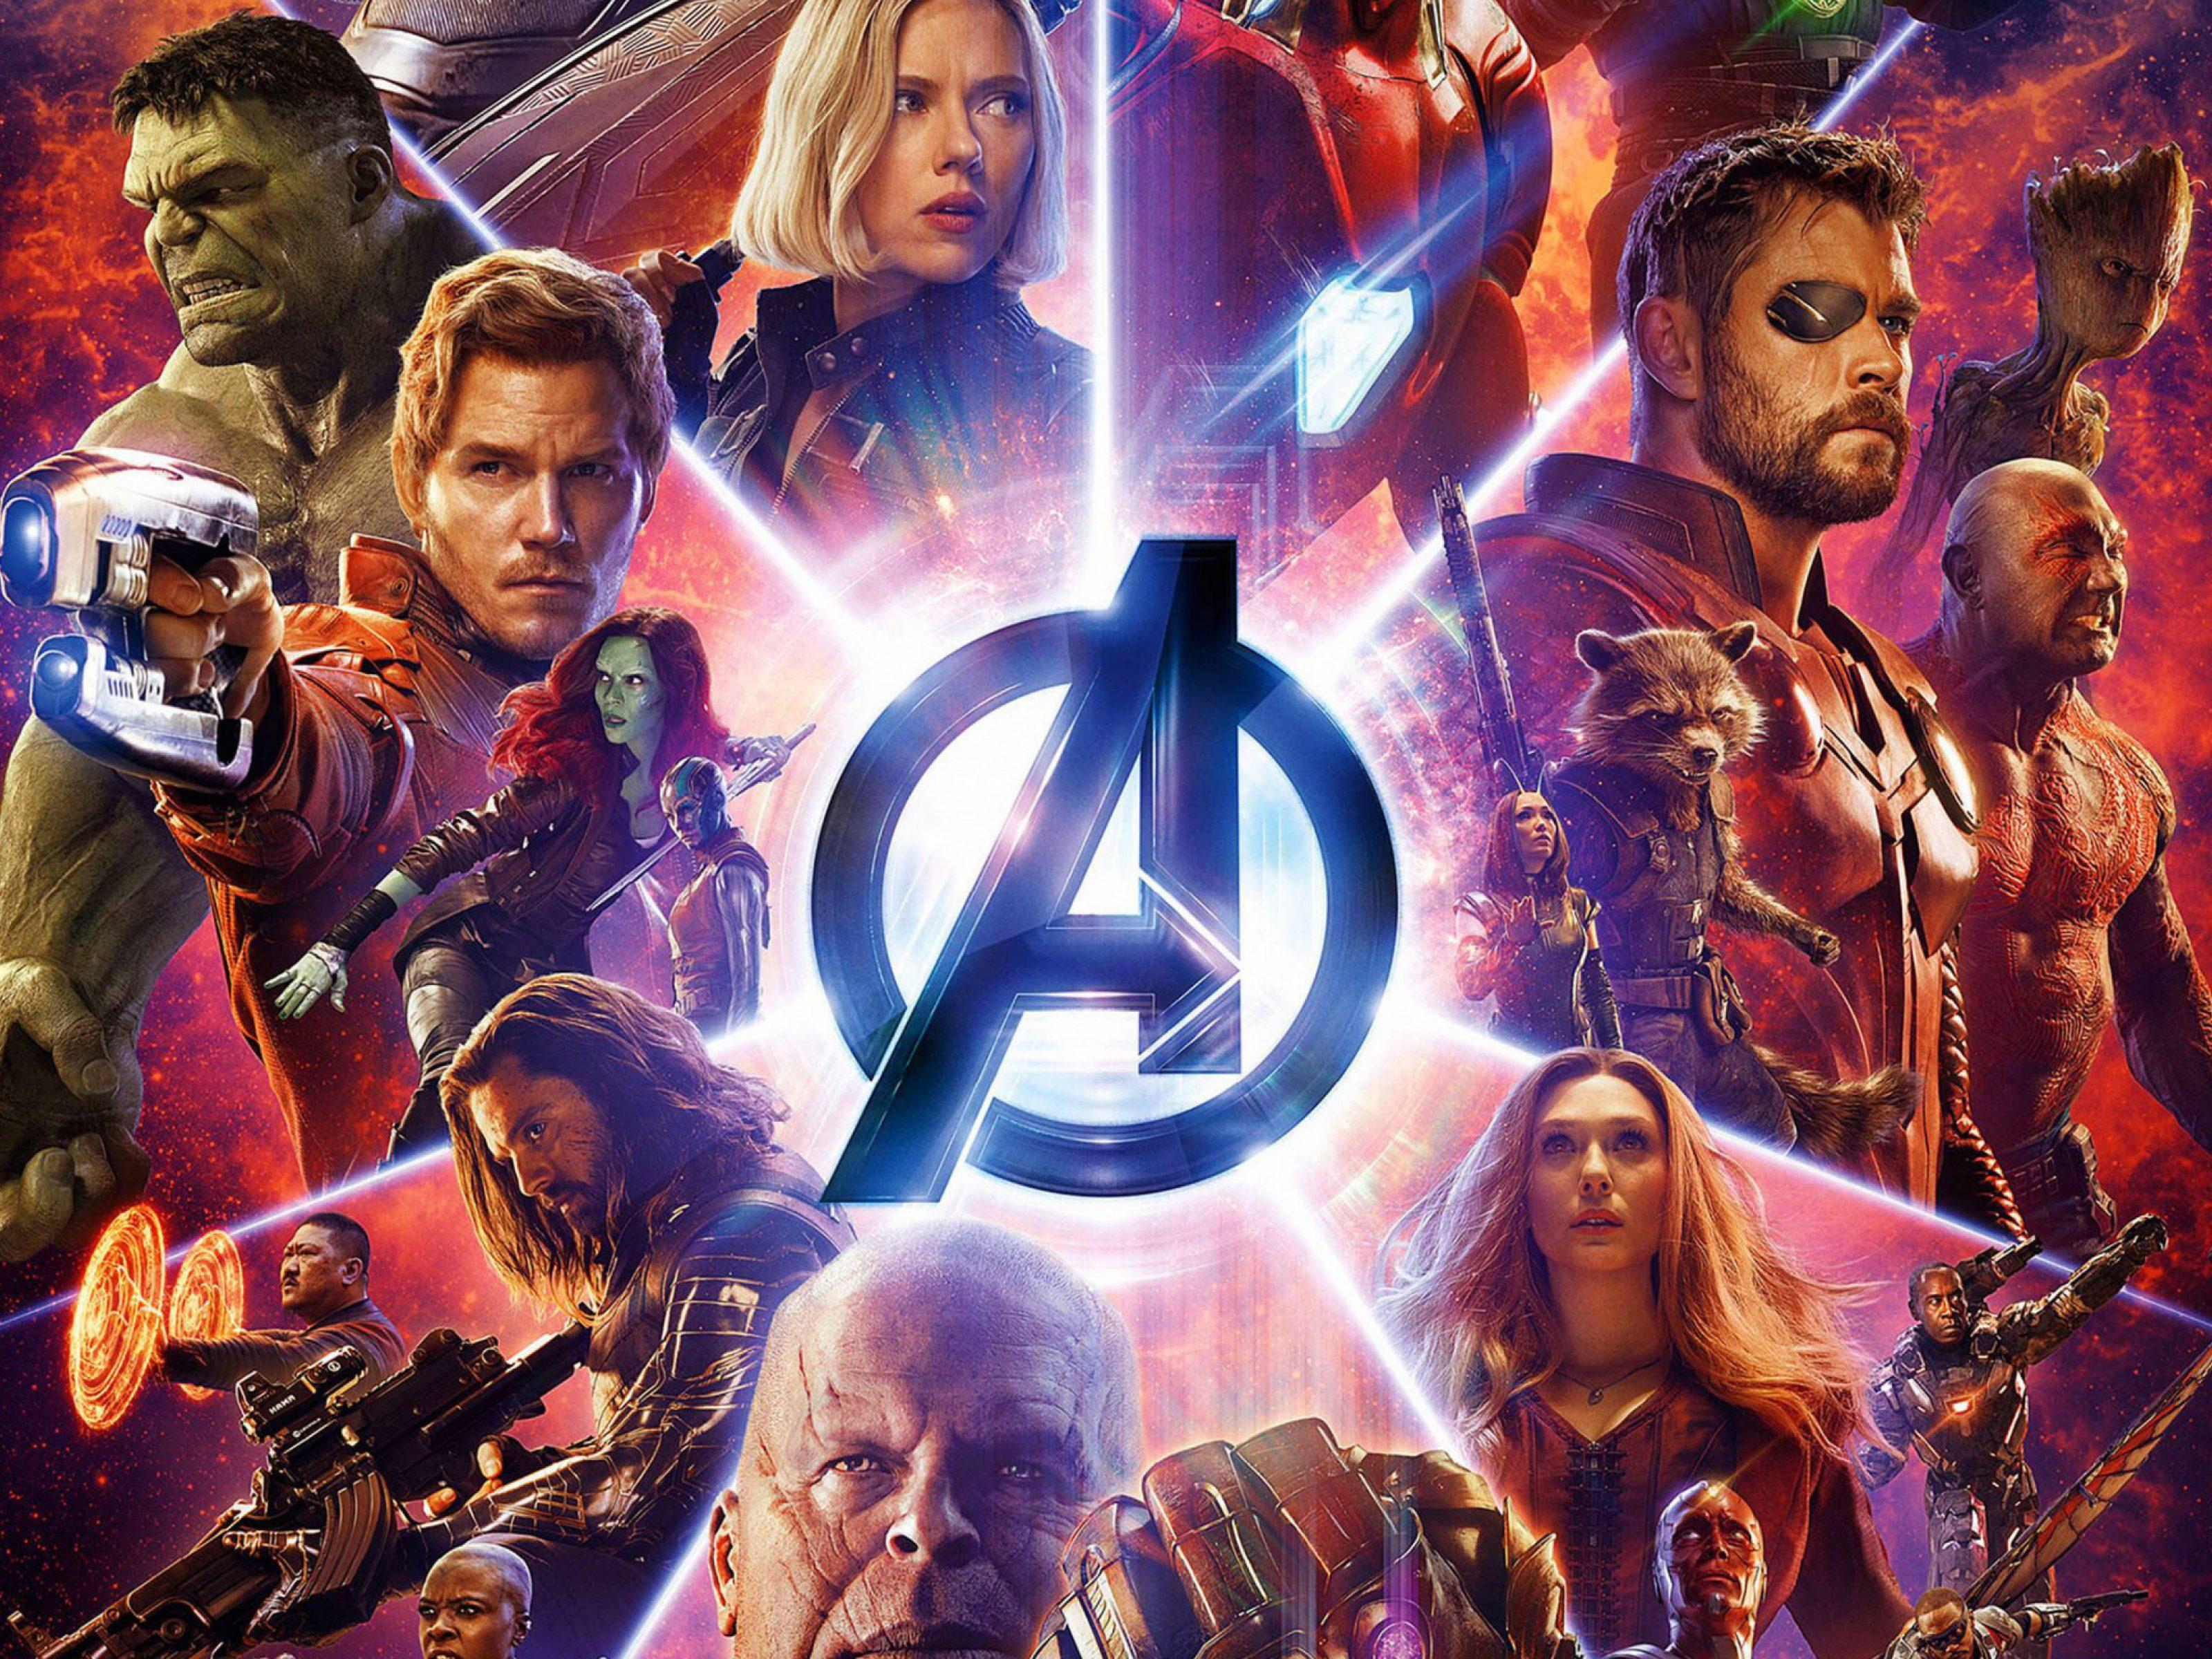 Avengers Infinity War 2018 4k Uhd Wallpaper